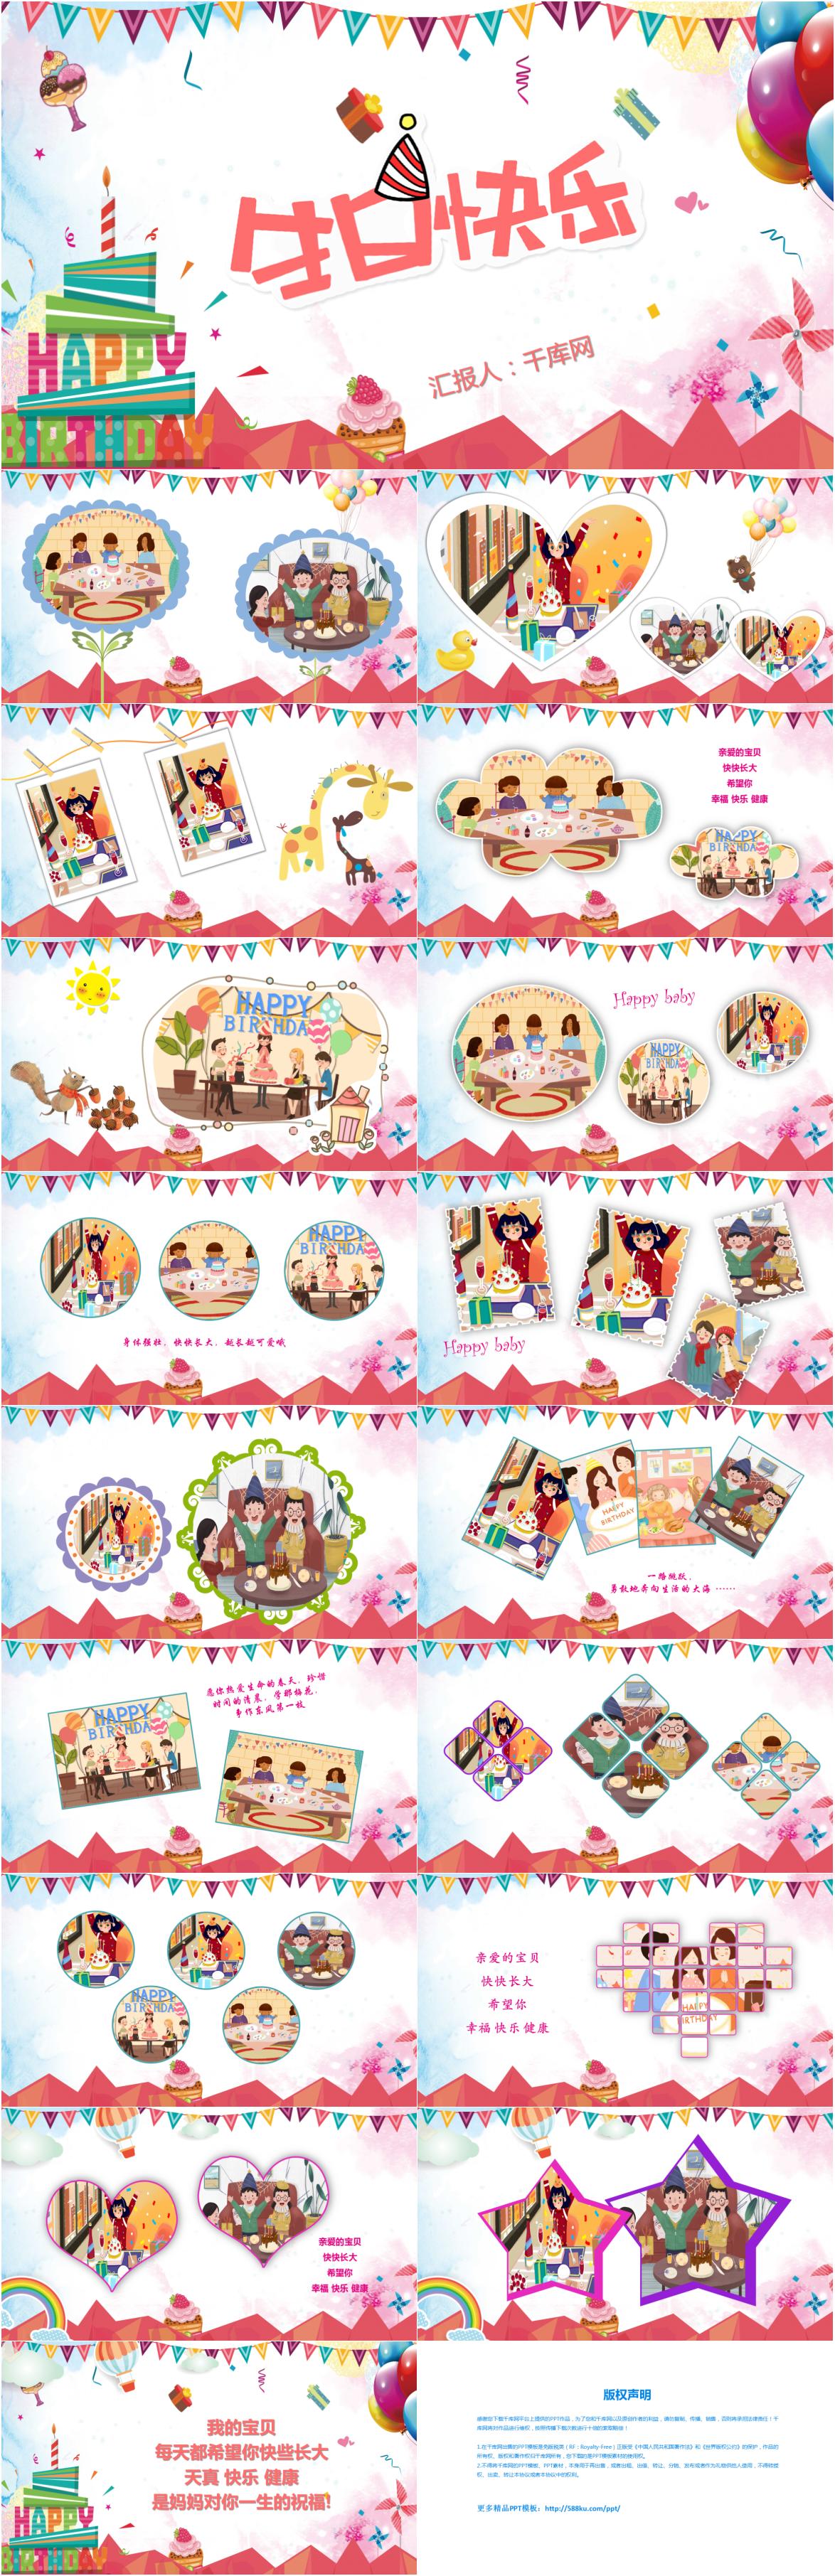 kartun anak anak tumbuh selamat ulang tahun template ppt